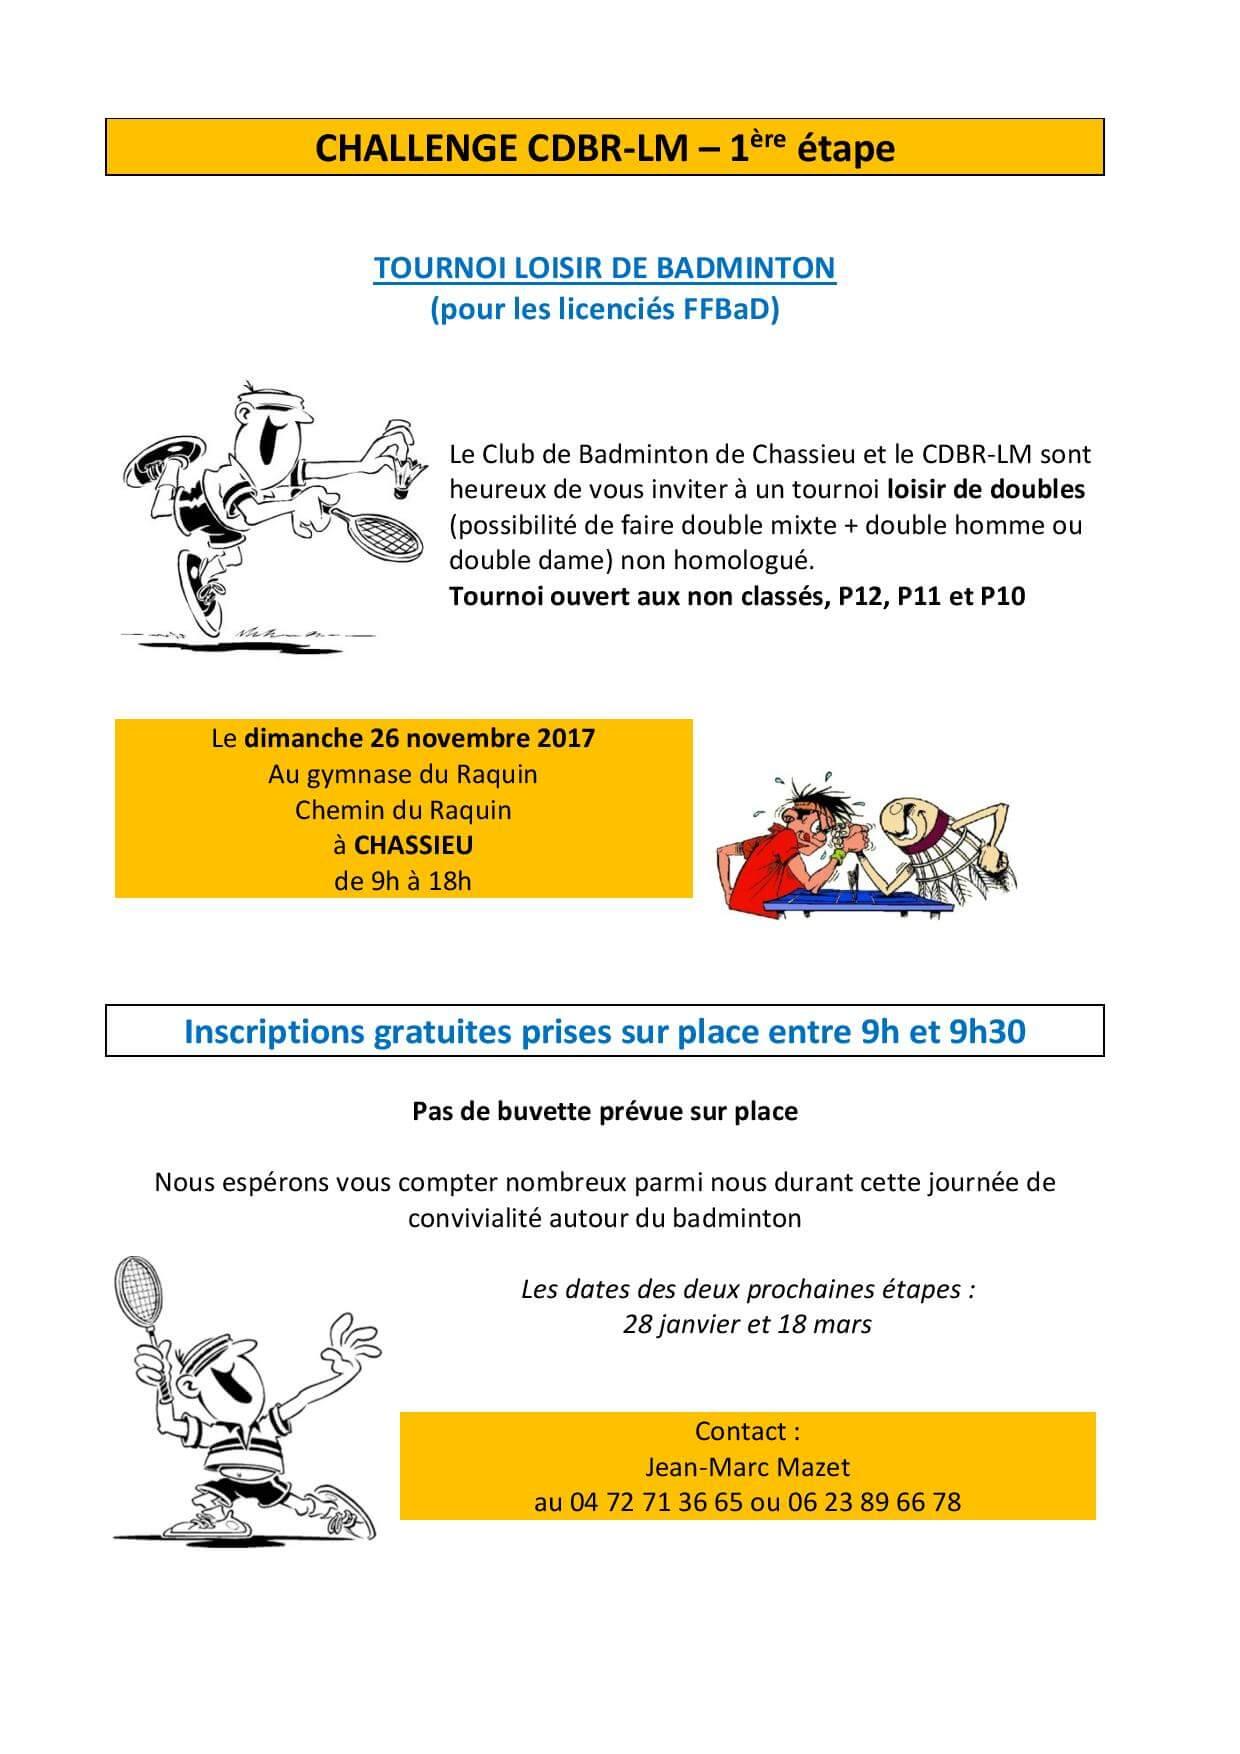 ChallengeCDBR-LM1_Plaquette-page-001